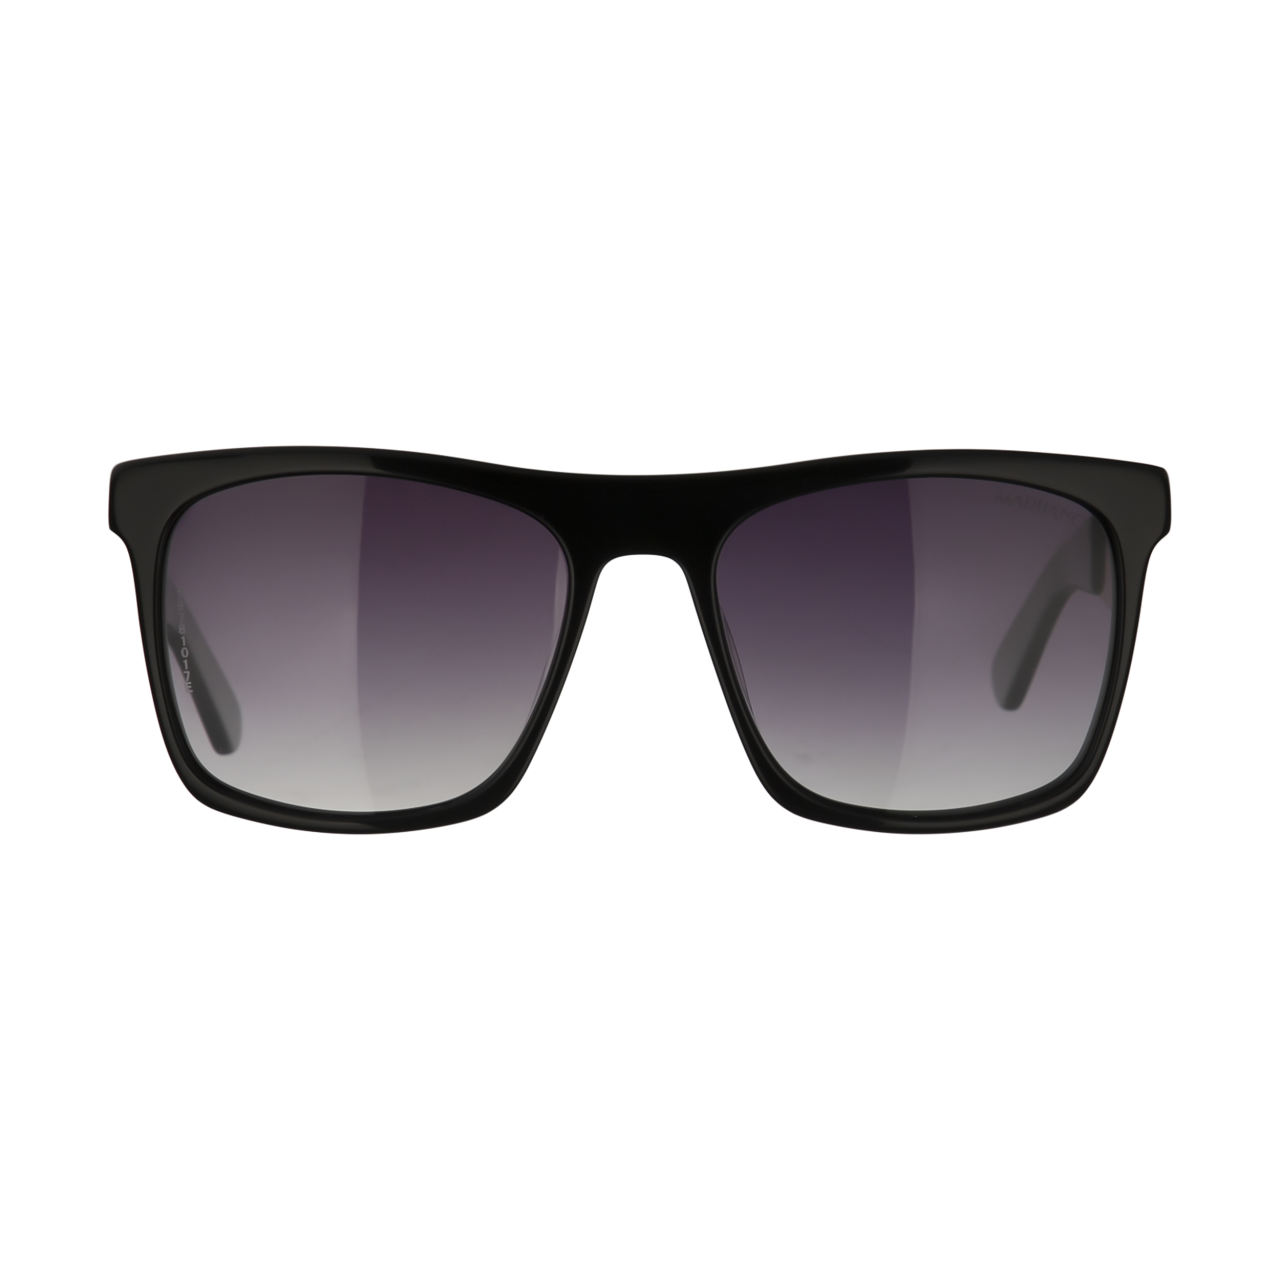 عینک آفتابی مردانه مارتیانو مدل mt1001 c1